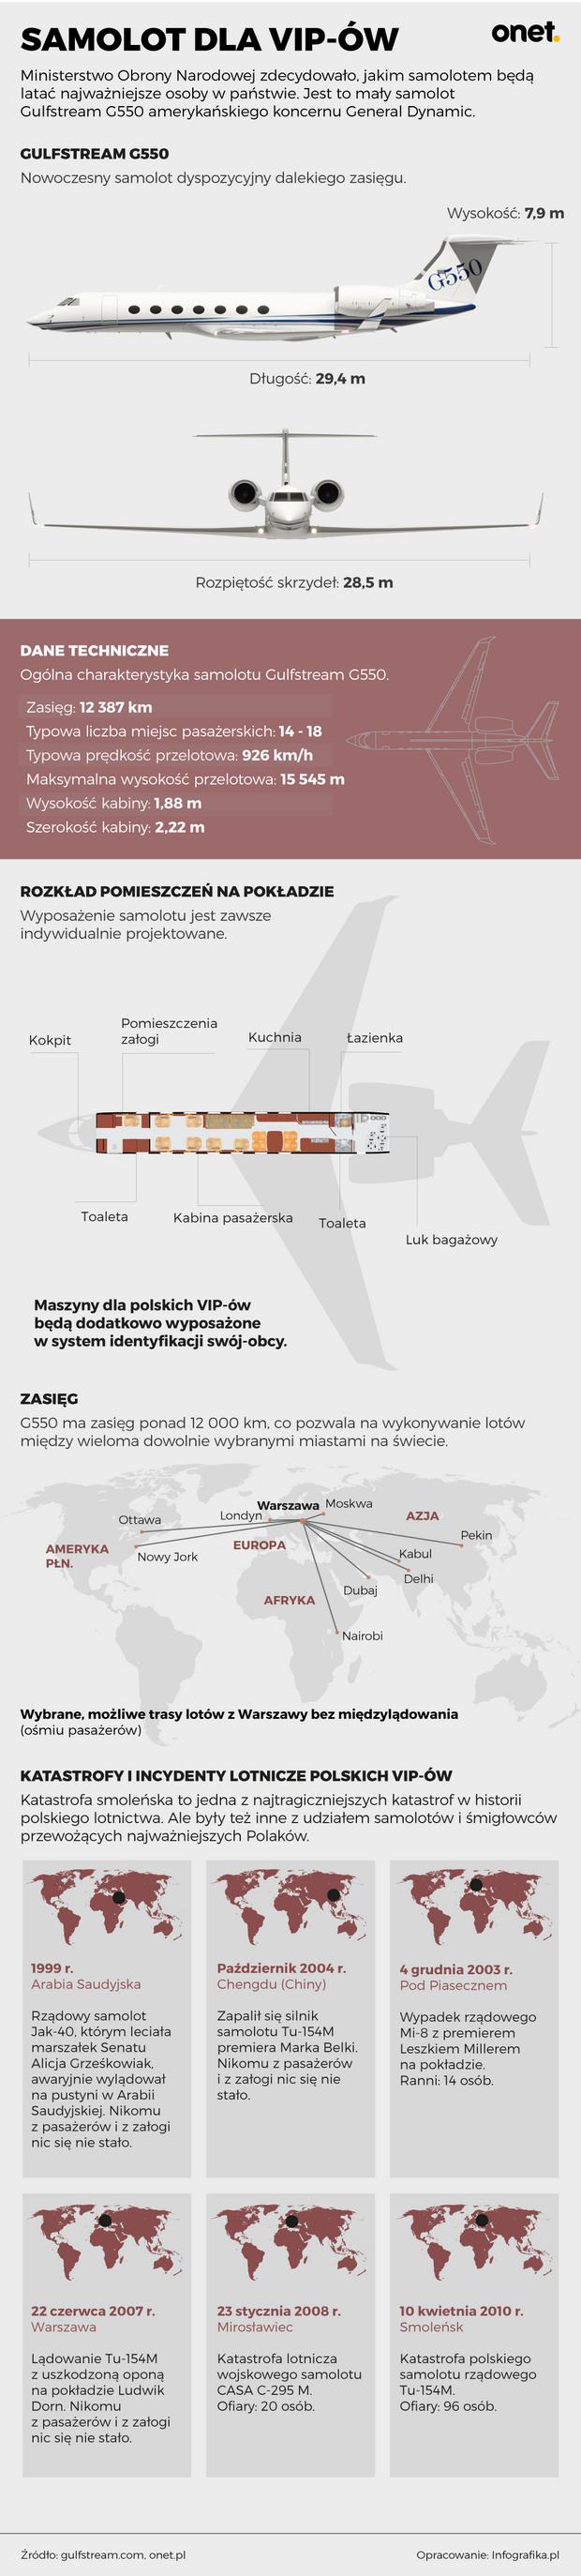 Samolot dla VIP-ów [INFOGRAFIKA]